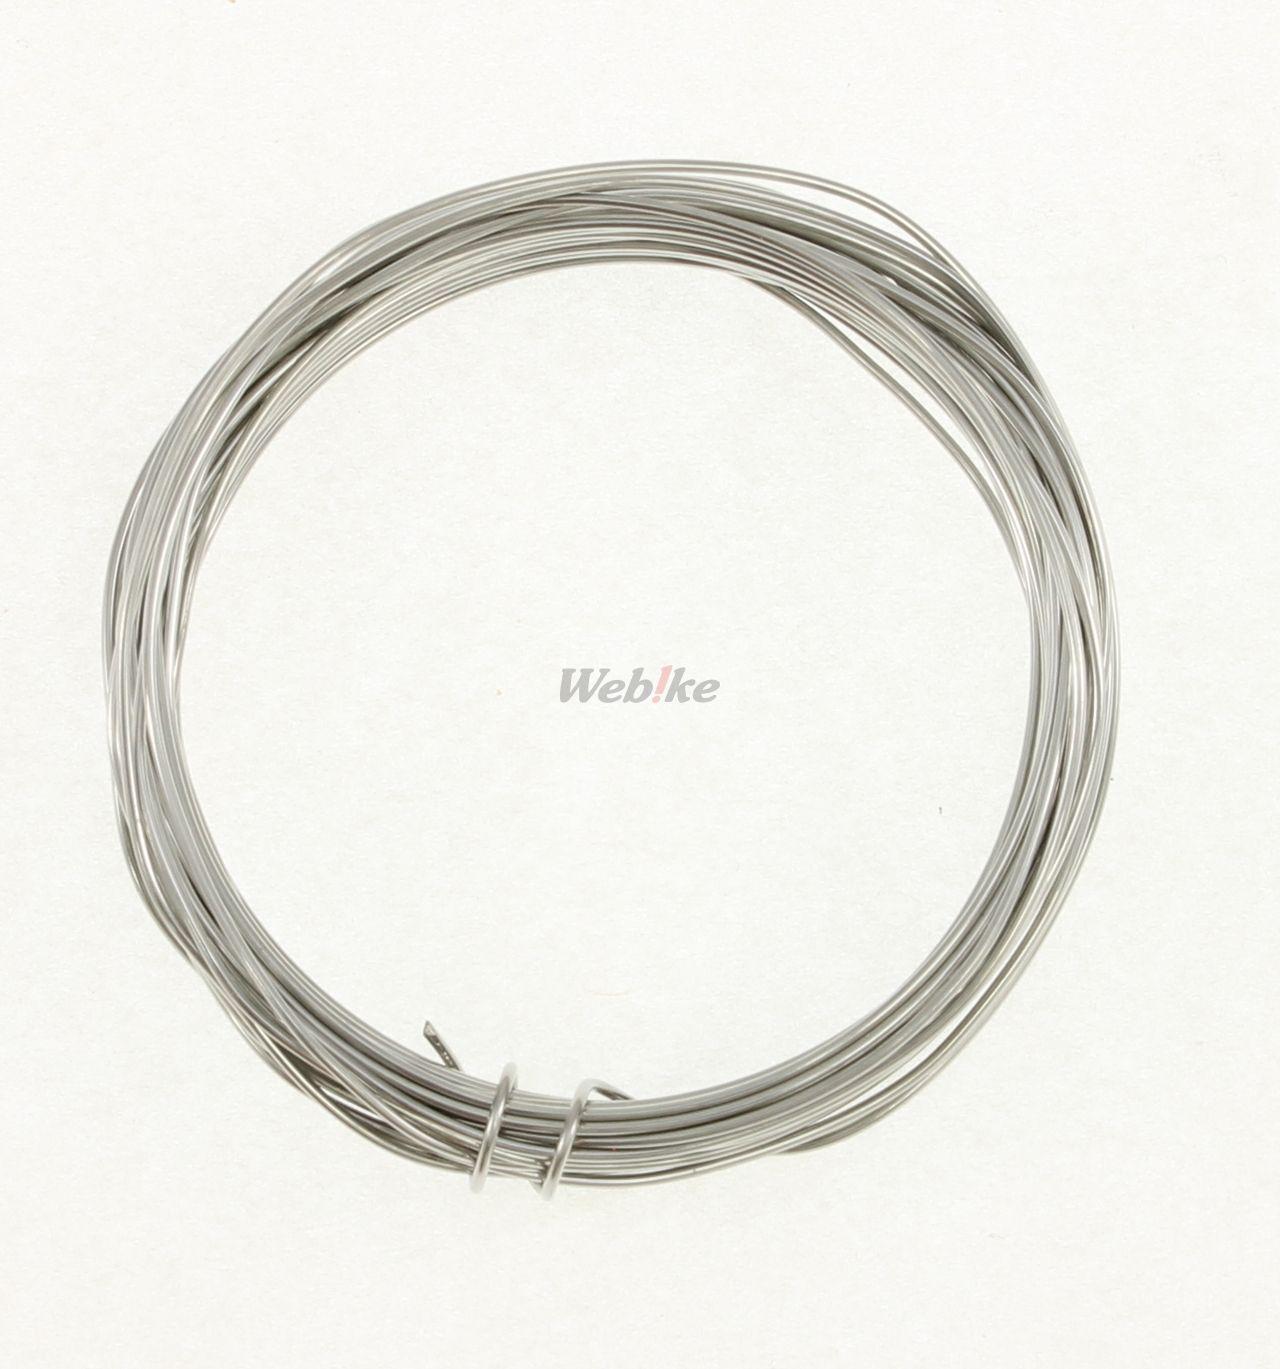 【KITACO】不銹鋼保險鋼絲 (0.80mm) 5M - 「Webike-摩托百貨」